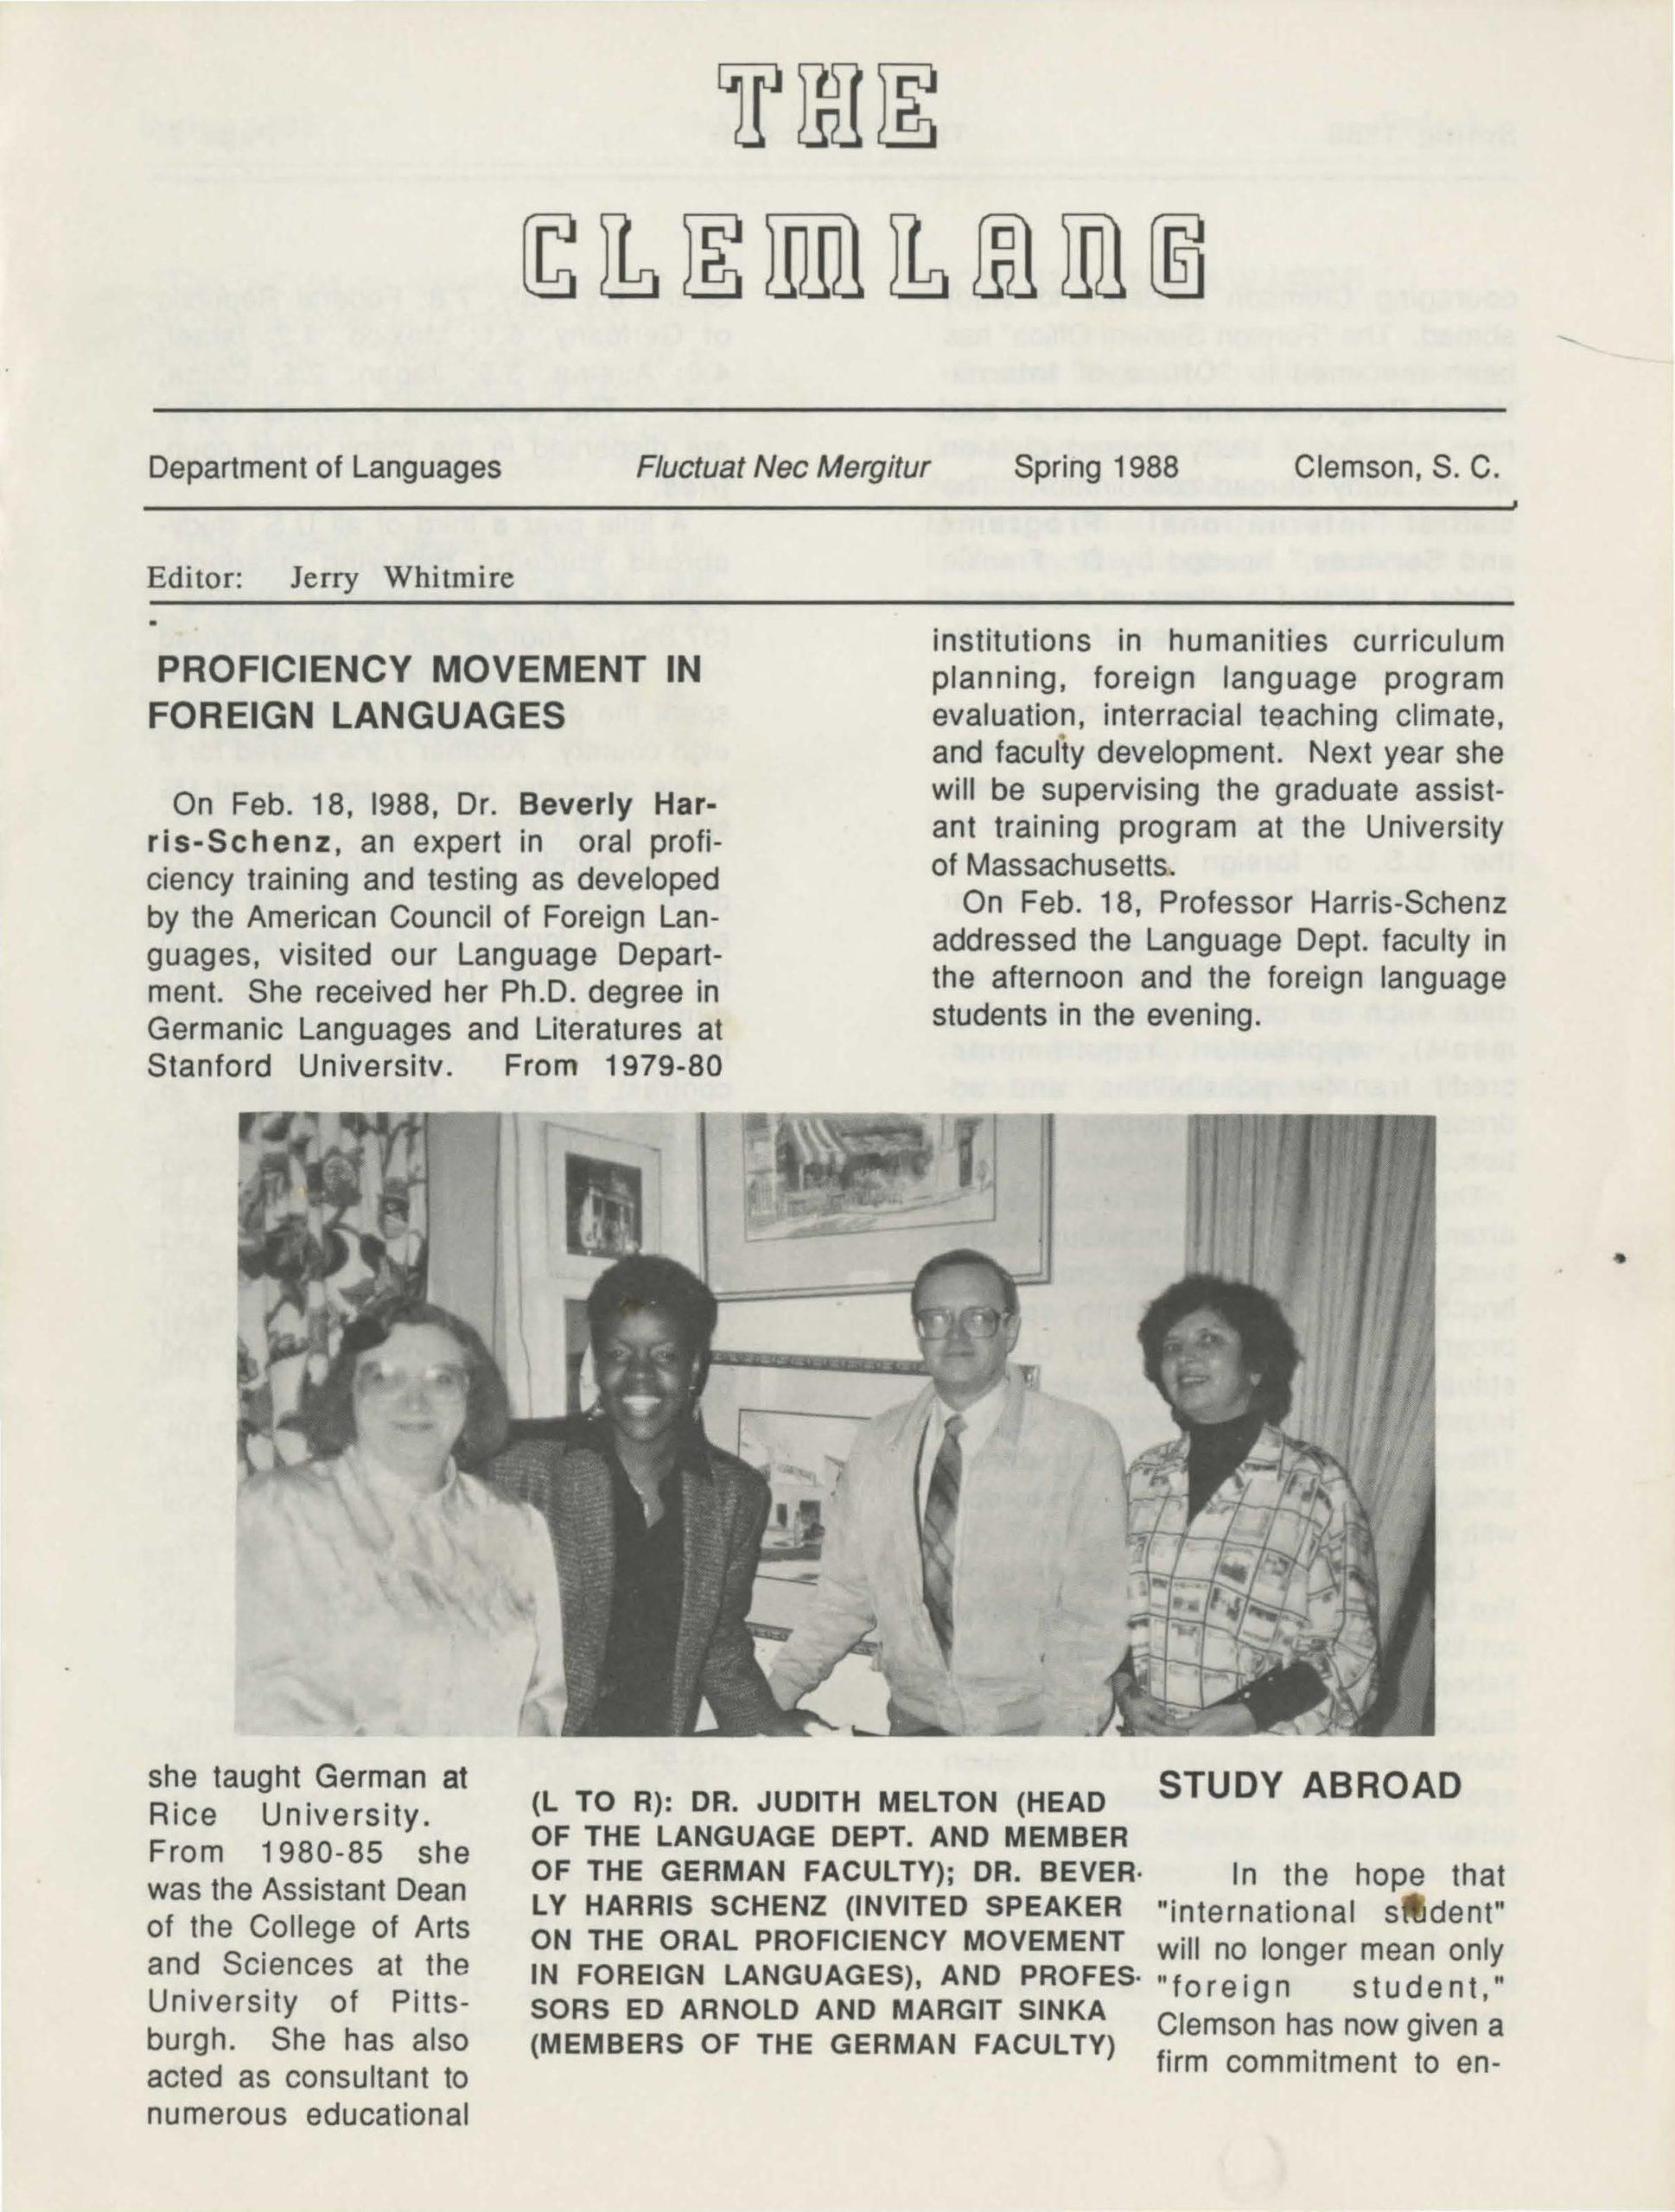 Clemson University Department of Languages Newsletters